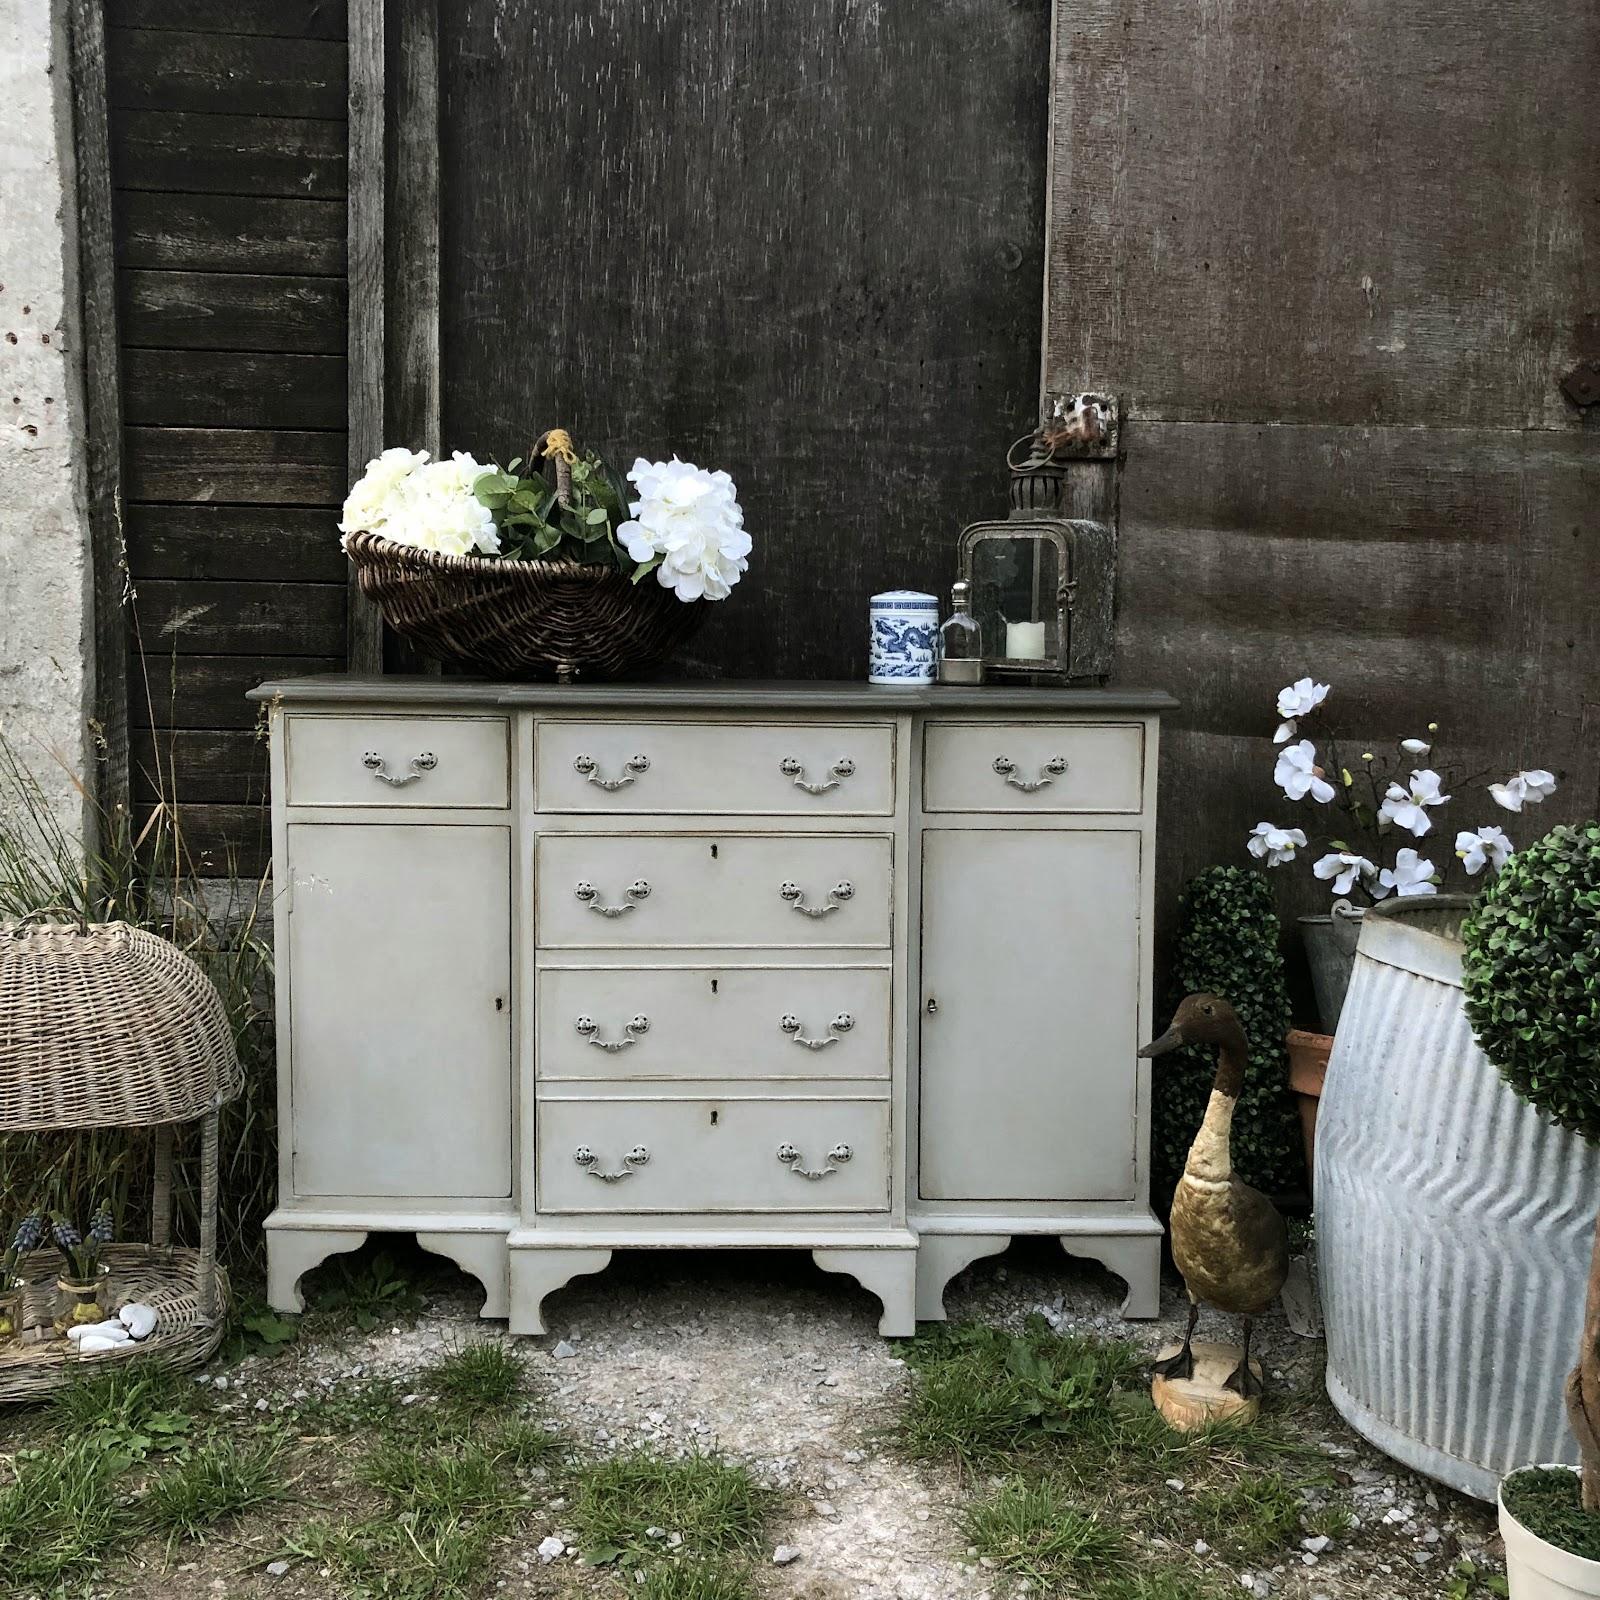 Shabby chic handmade vintage sideboard